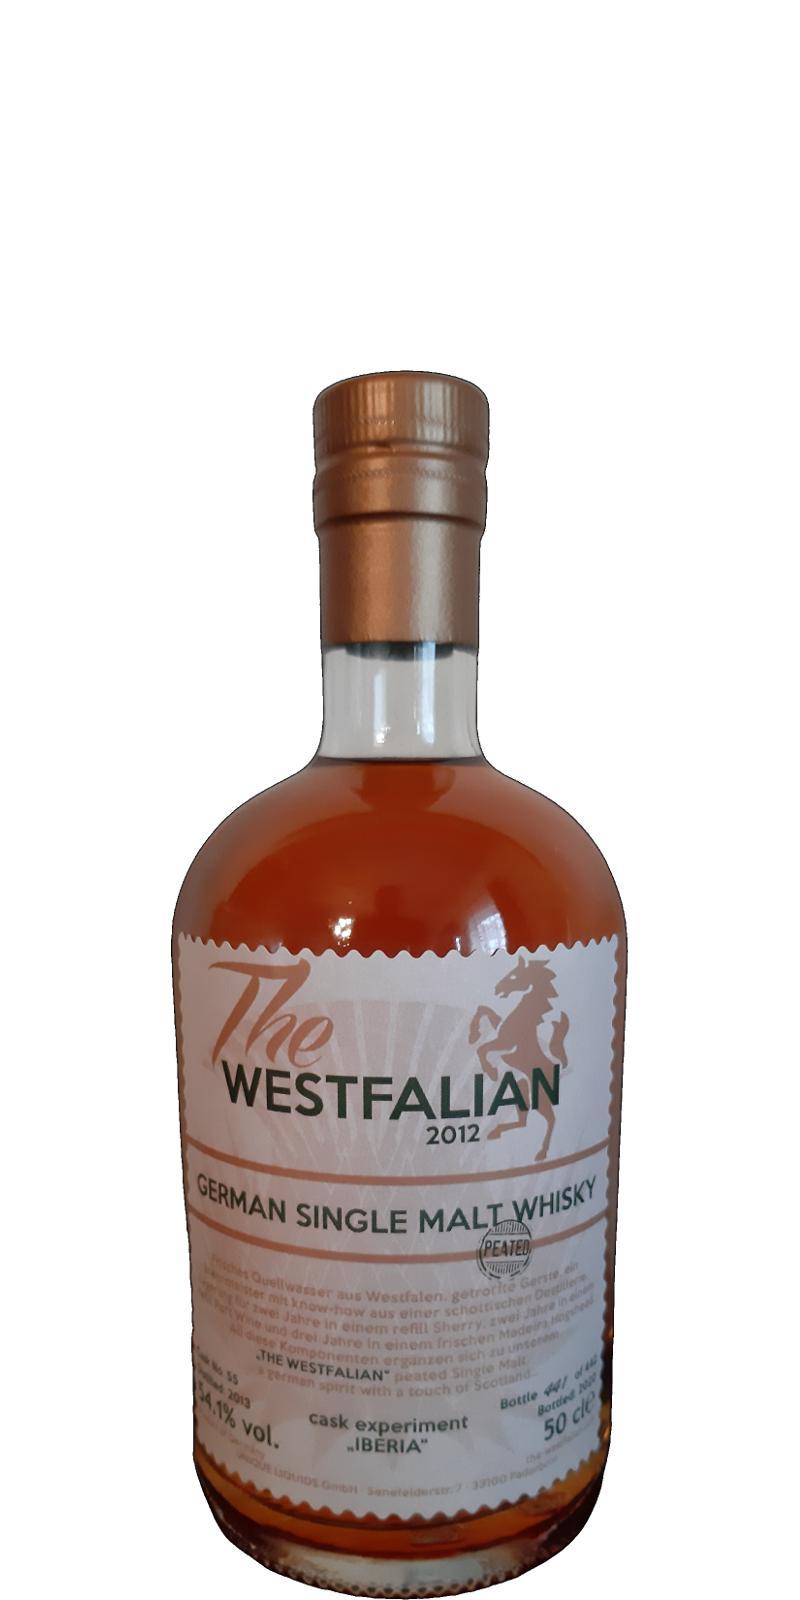 The Westfalian 2013 Peated